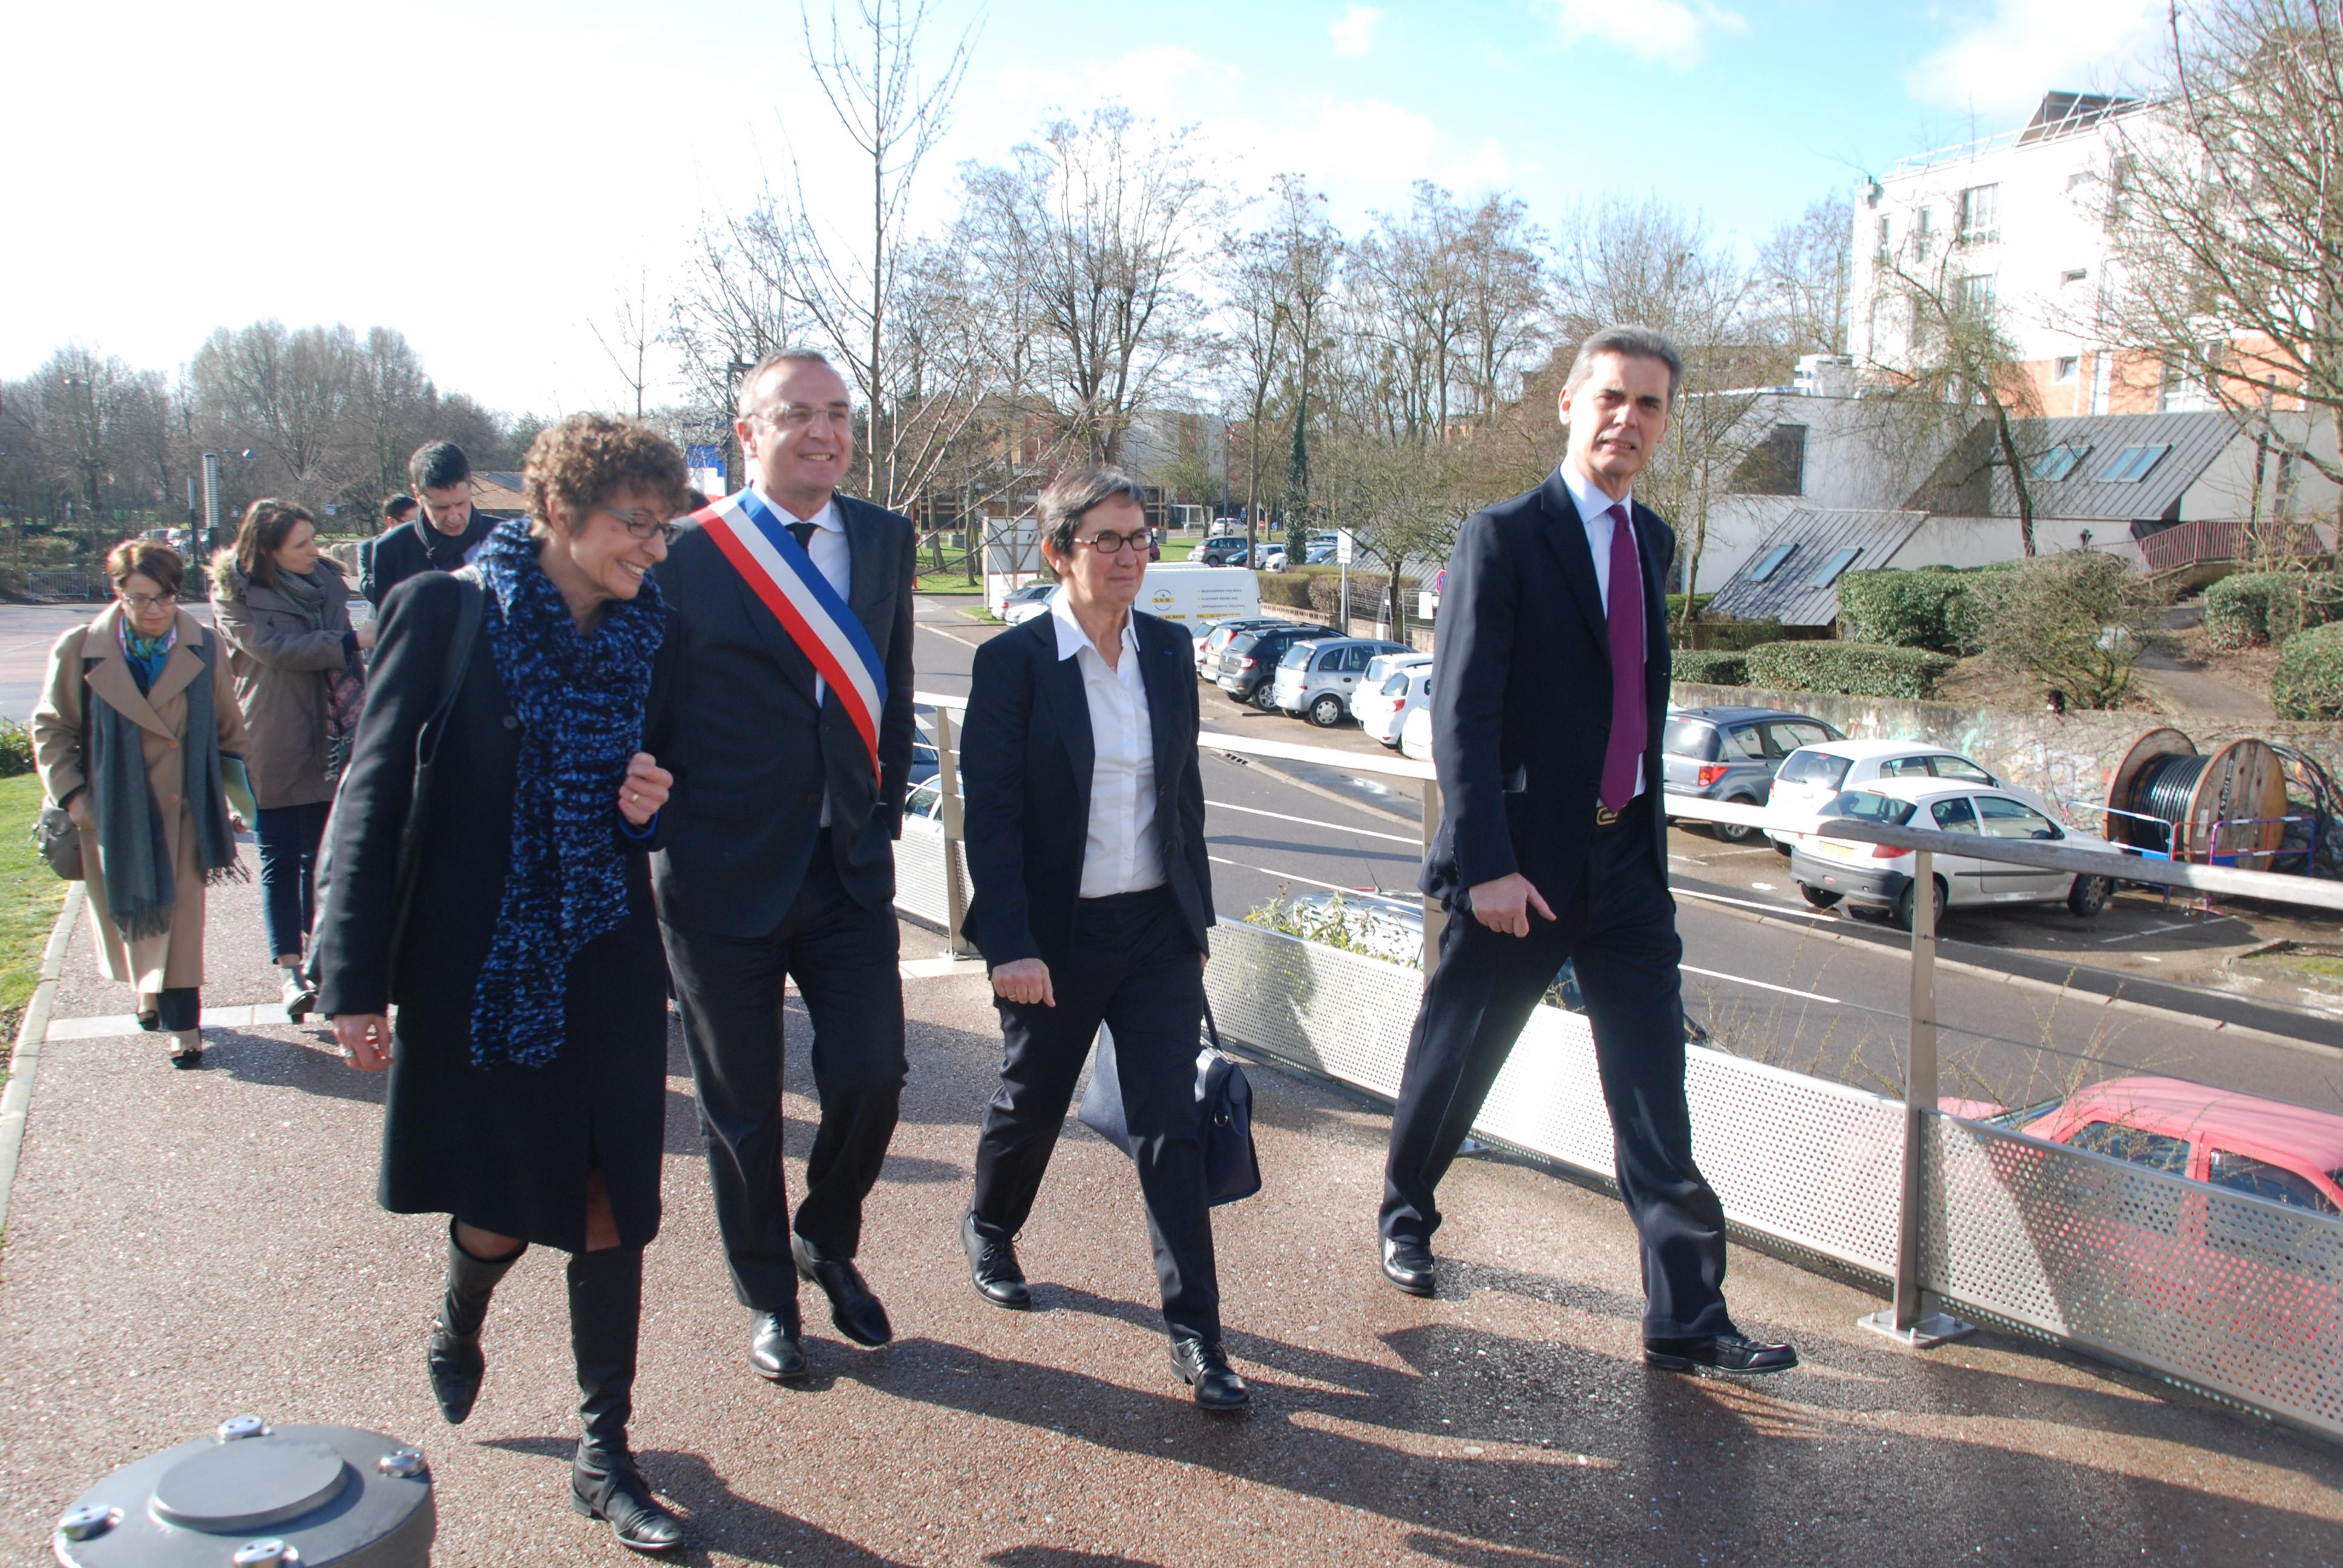 Visite de Valérie Fourneyron à Val-de-Reuil